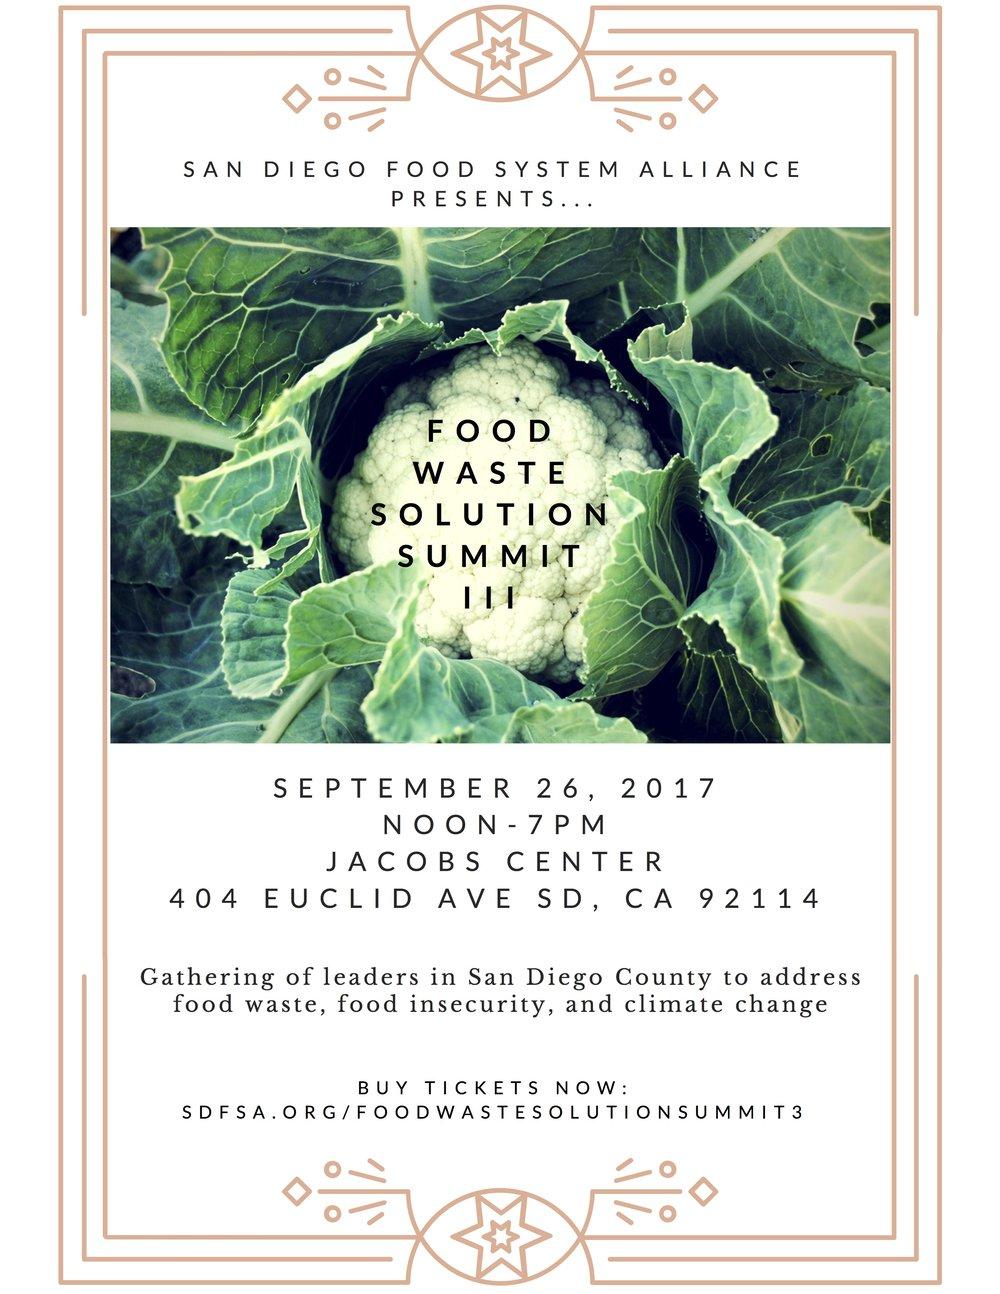 San Diego food waste solutions summit